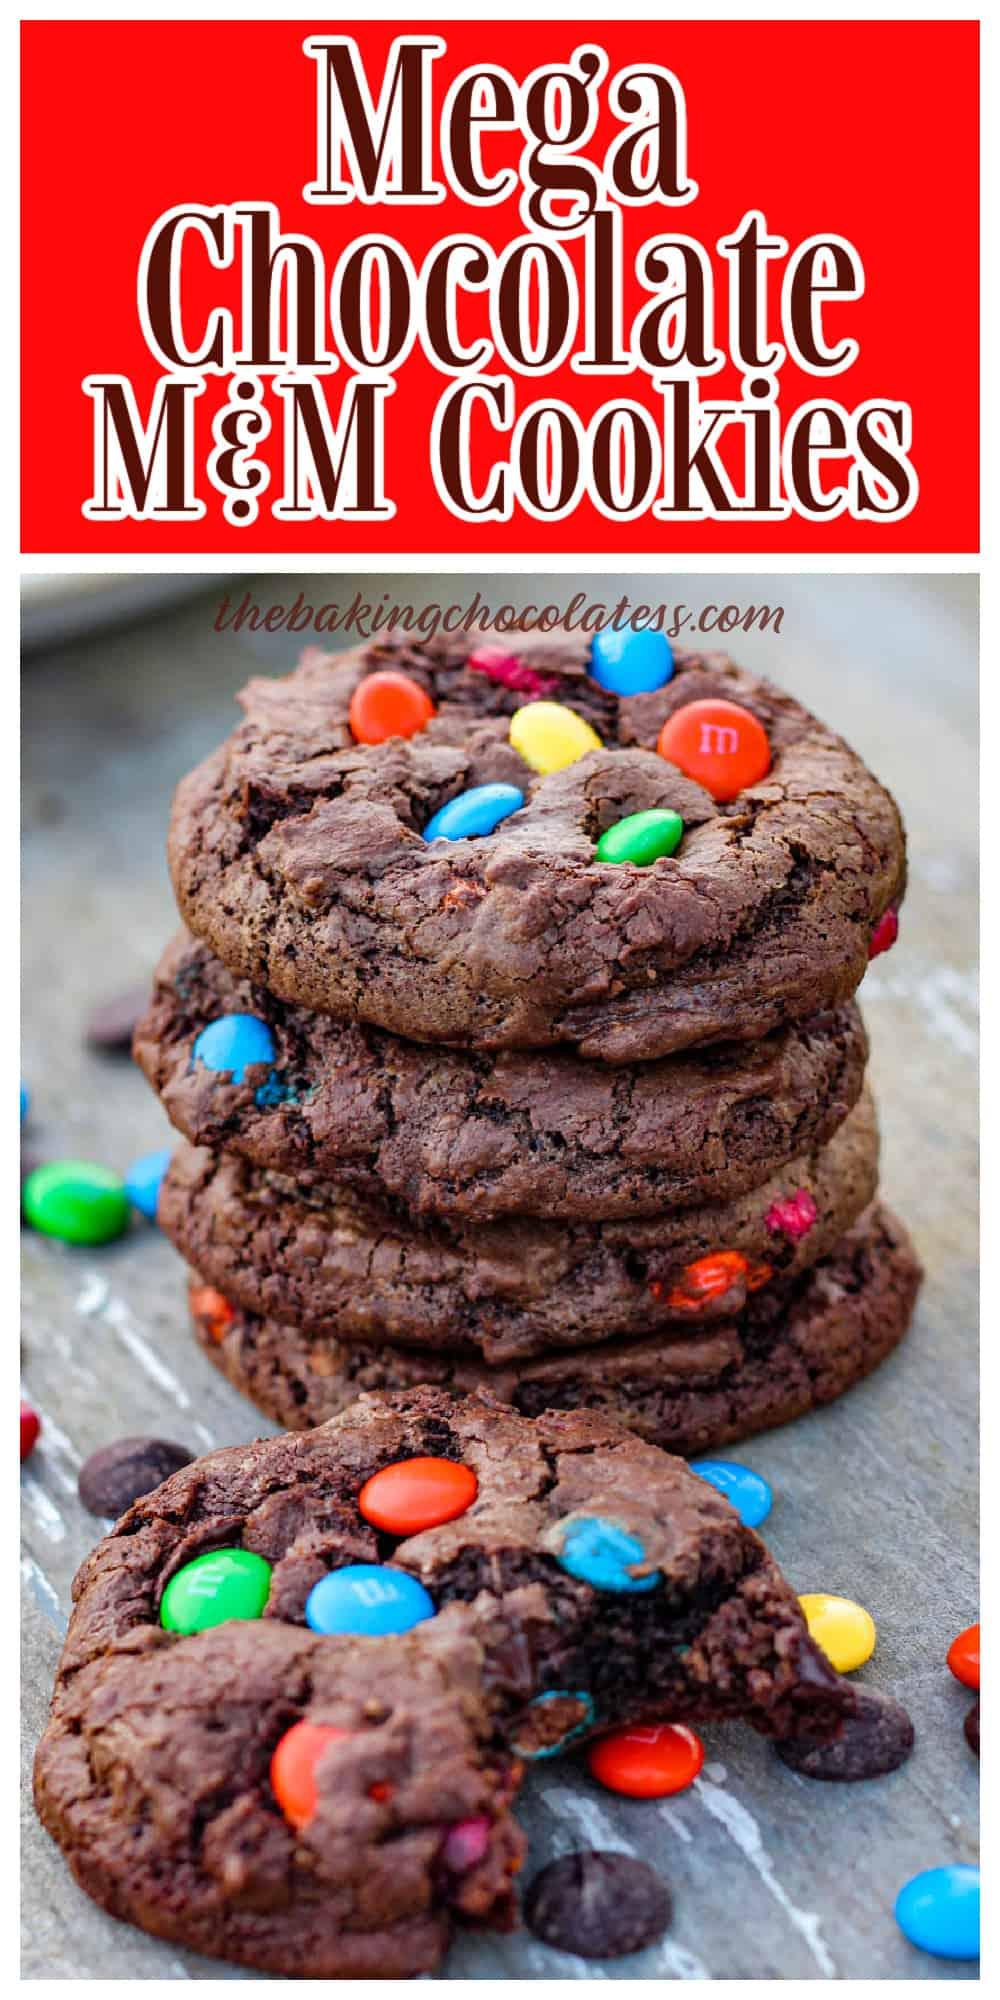 Mega Chocolate Chocolate Chip M&M Cookies